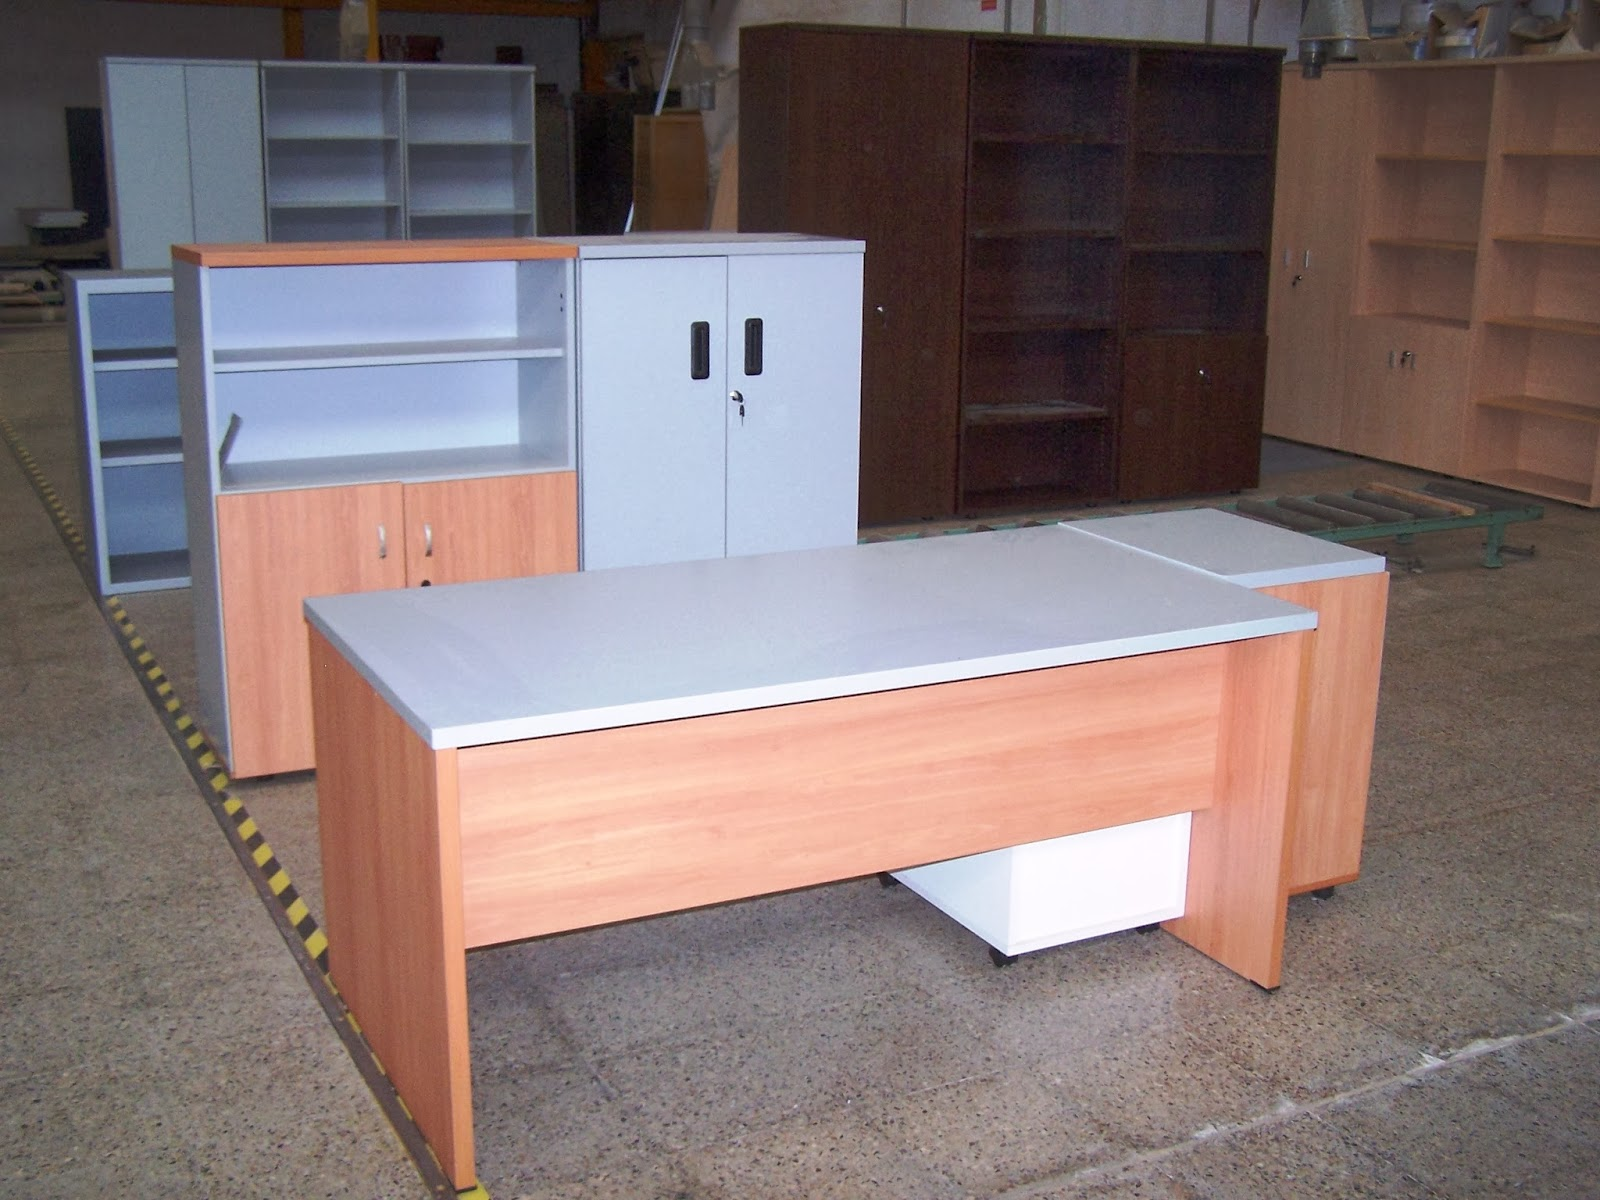 Muebles a 50 gmf liquidacion muebles de oficina for Muebles oficina baratos liquidacion por cierre